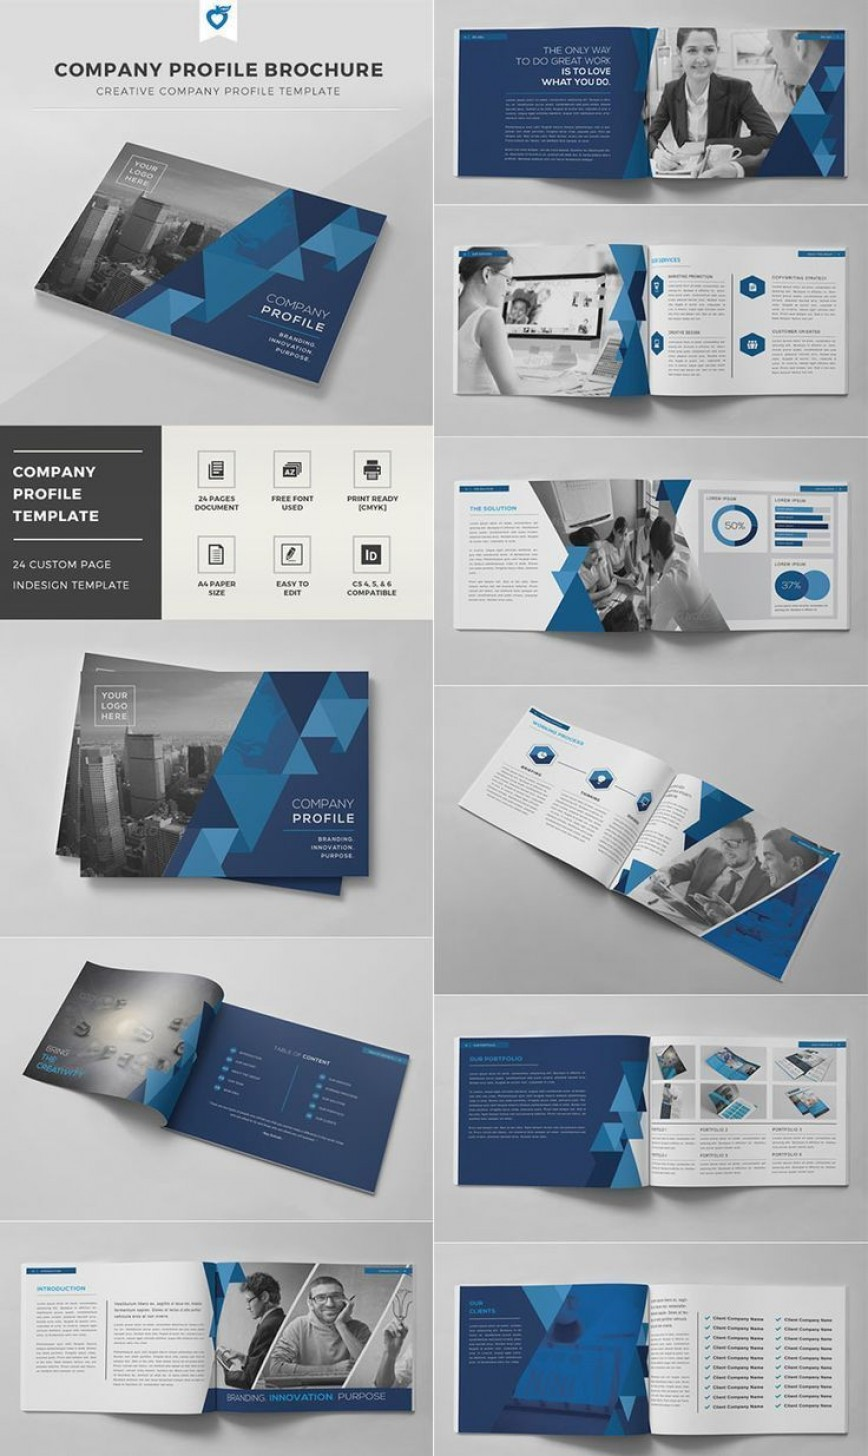 003 Astounding Busines Brochure Design Template Free Download Inspiration 868